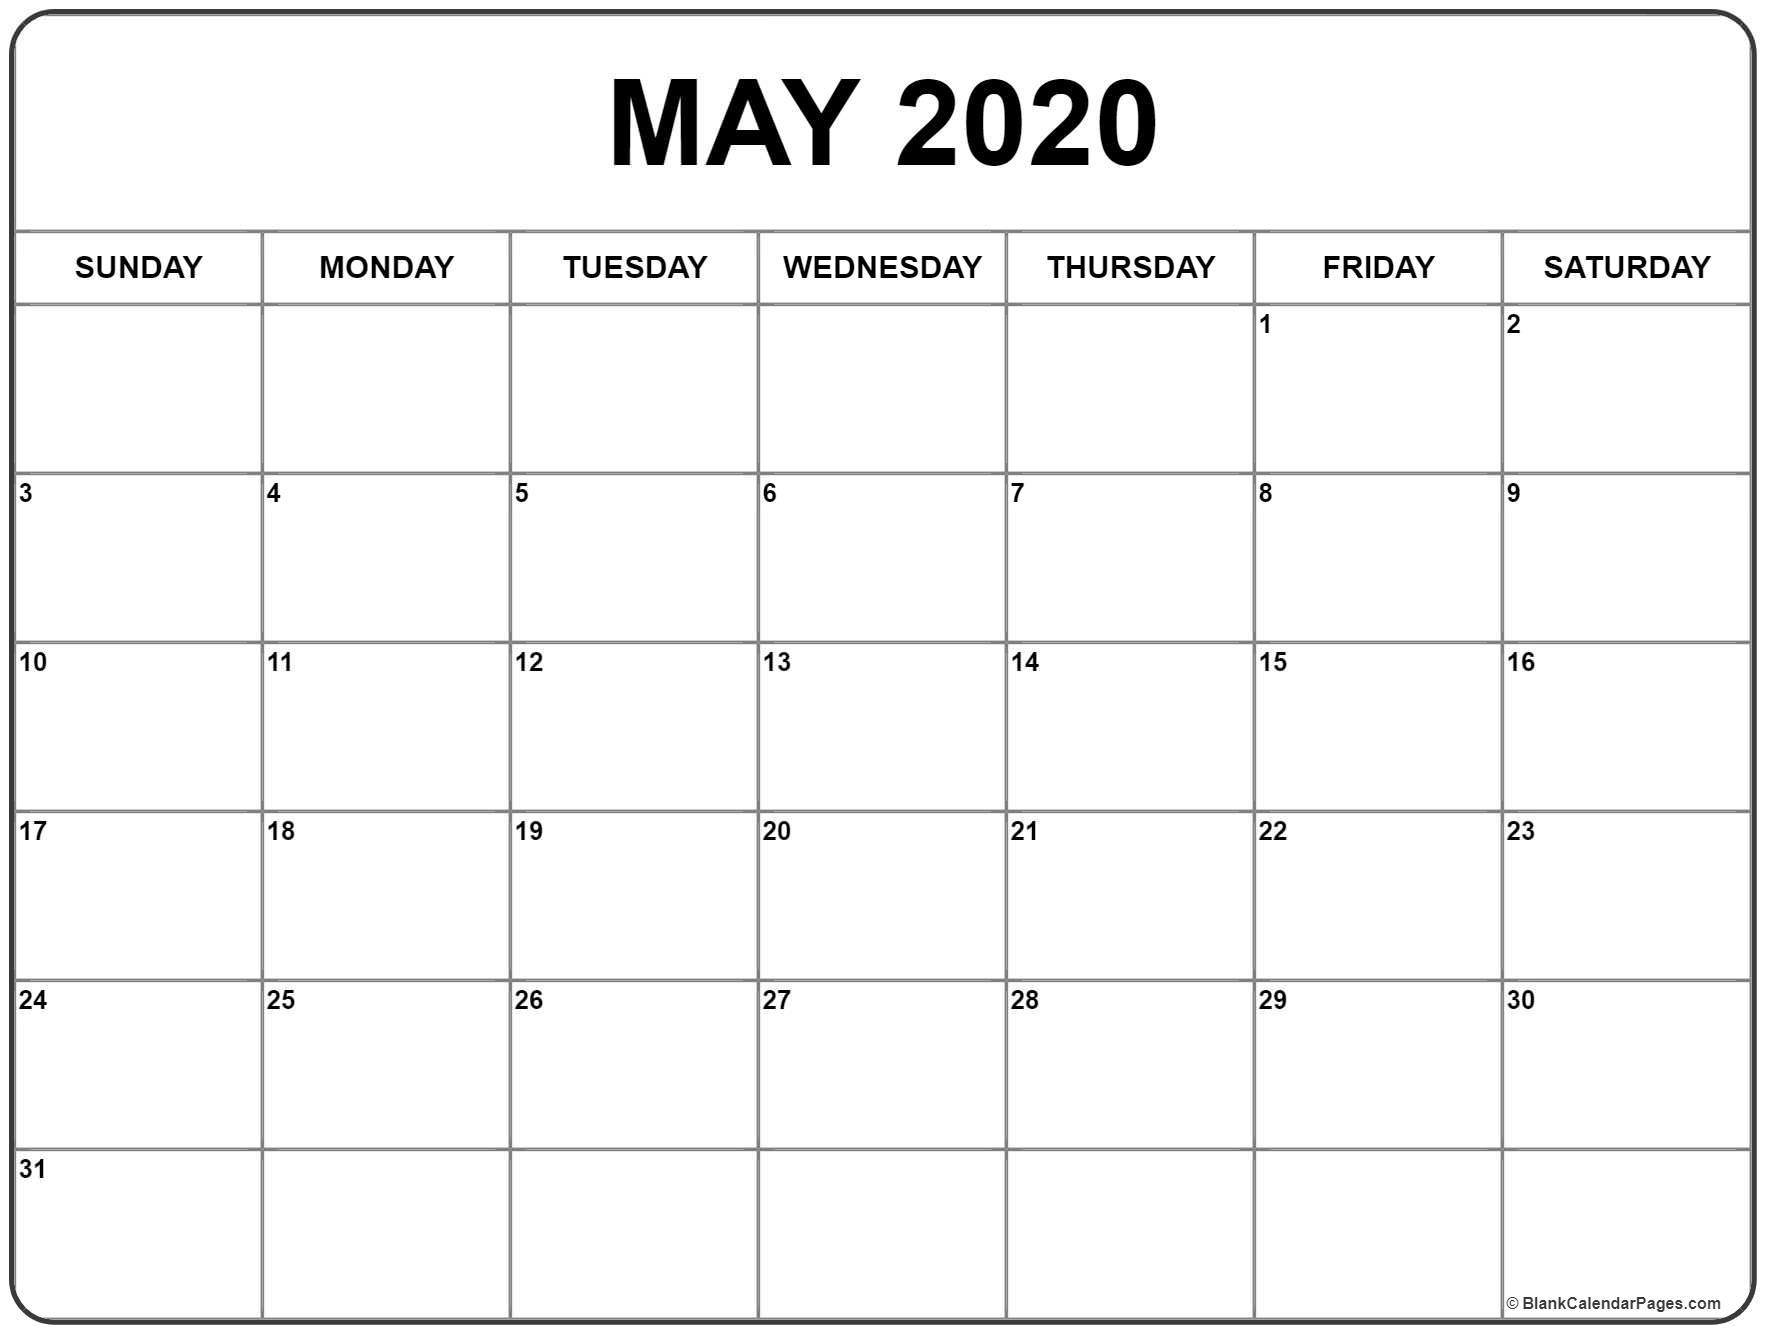 May 2020 Calendar | Free Printable Monthly Calendars inside Printable Calendar One Week Per Page 2020